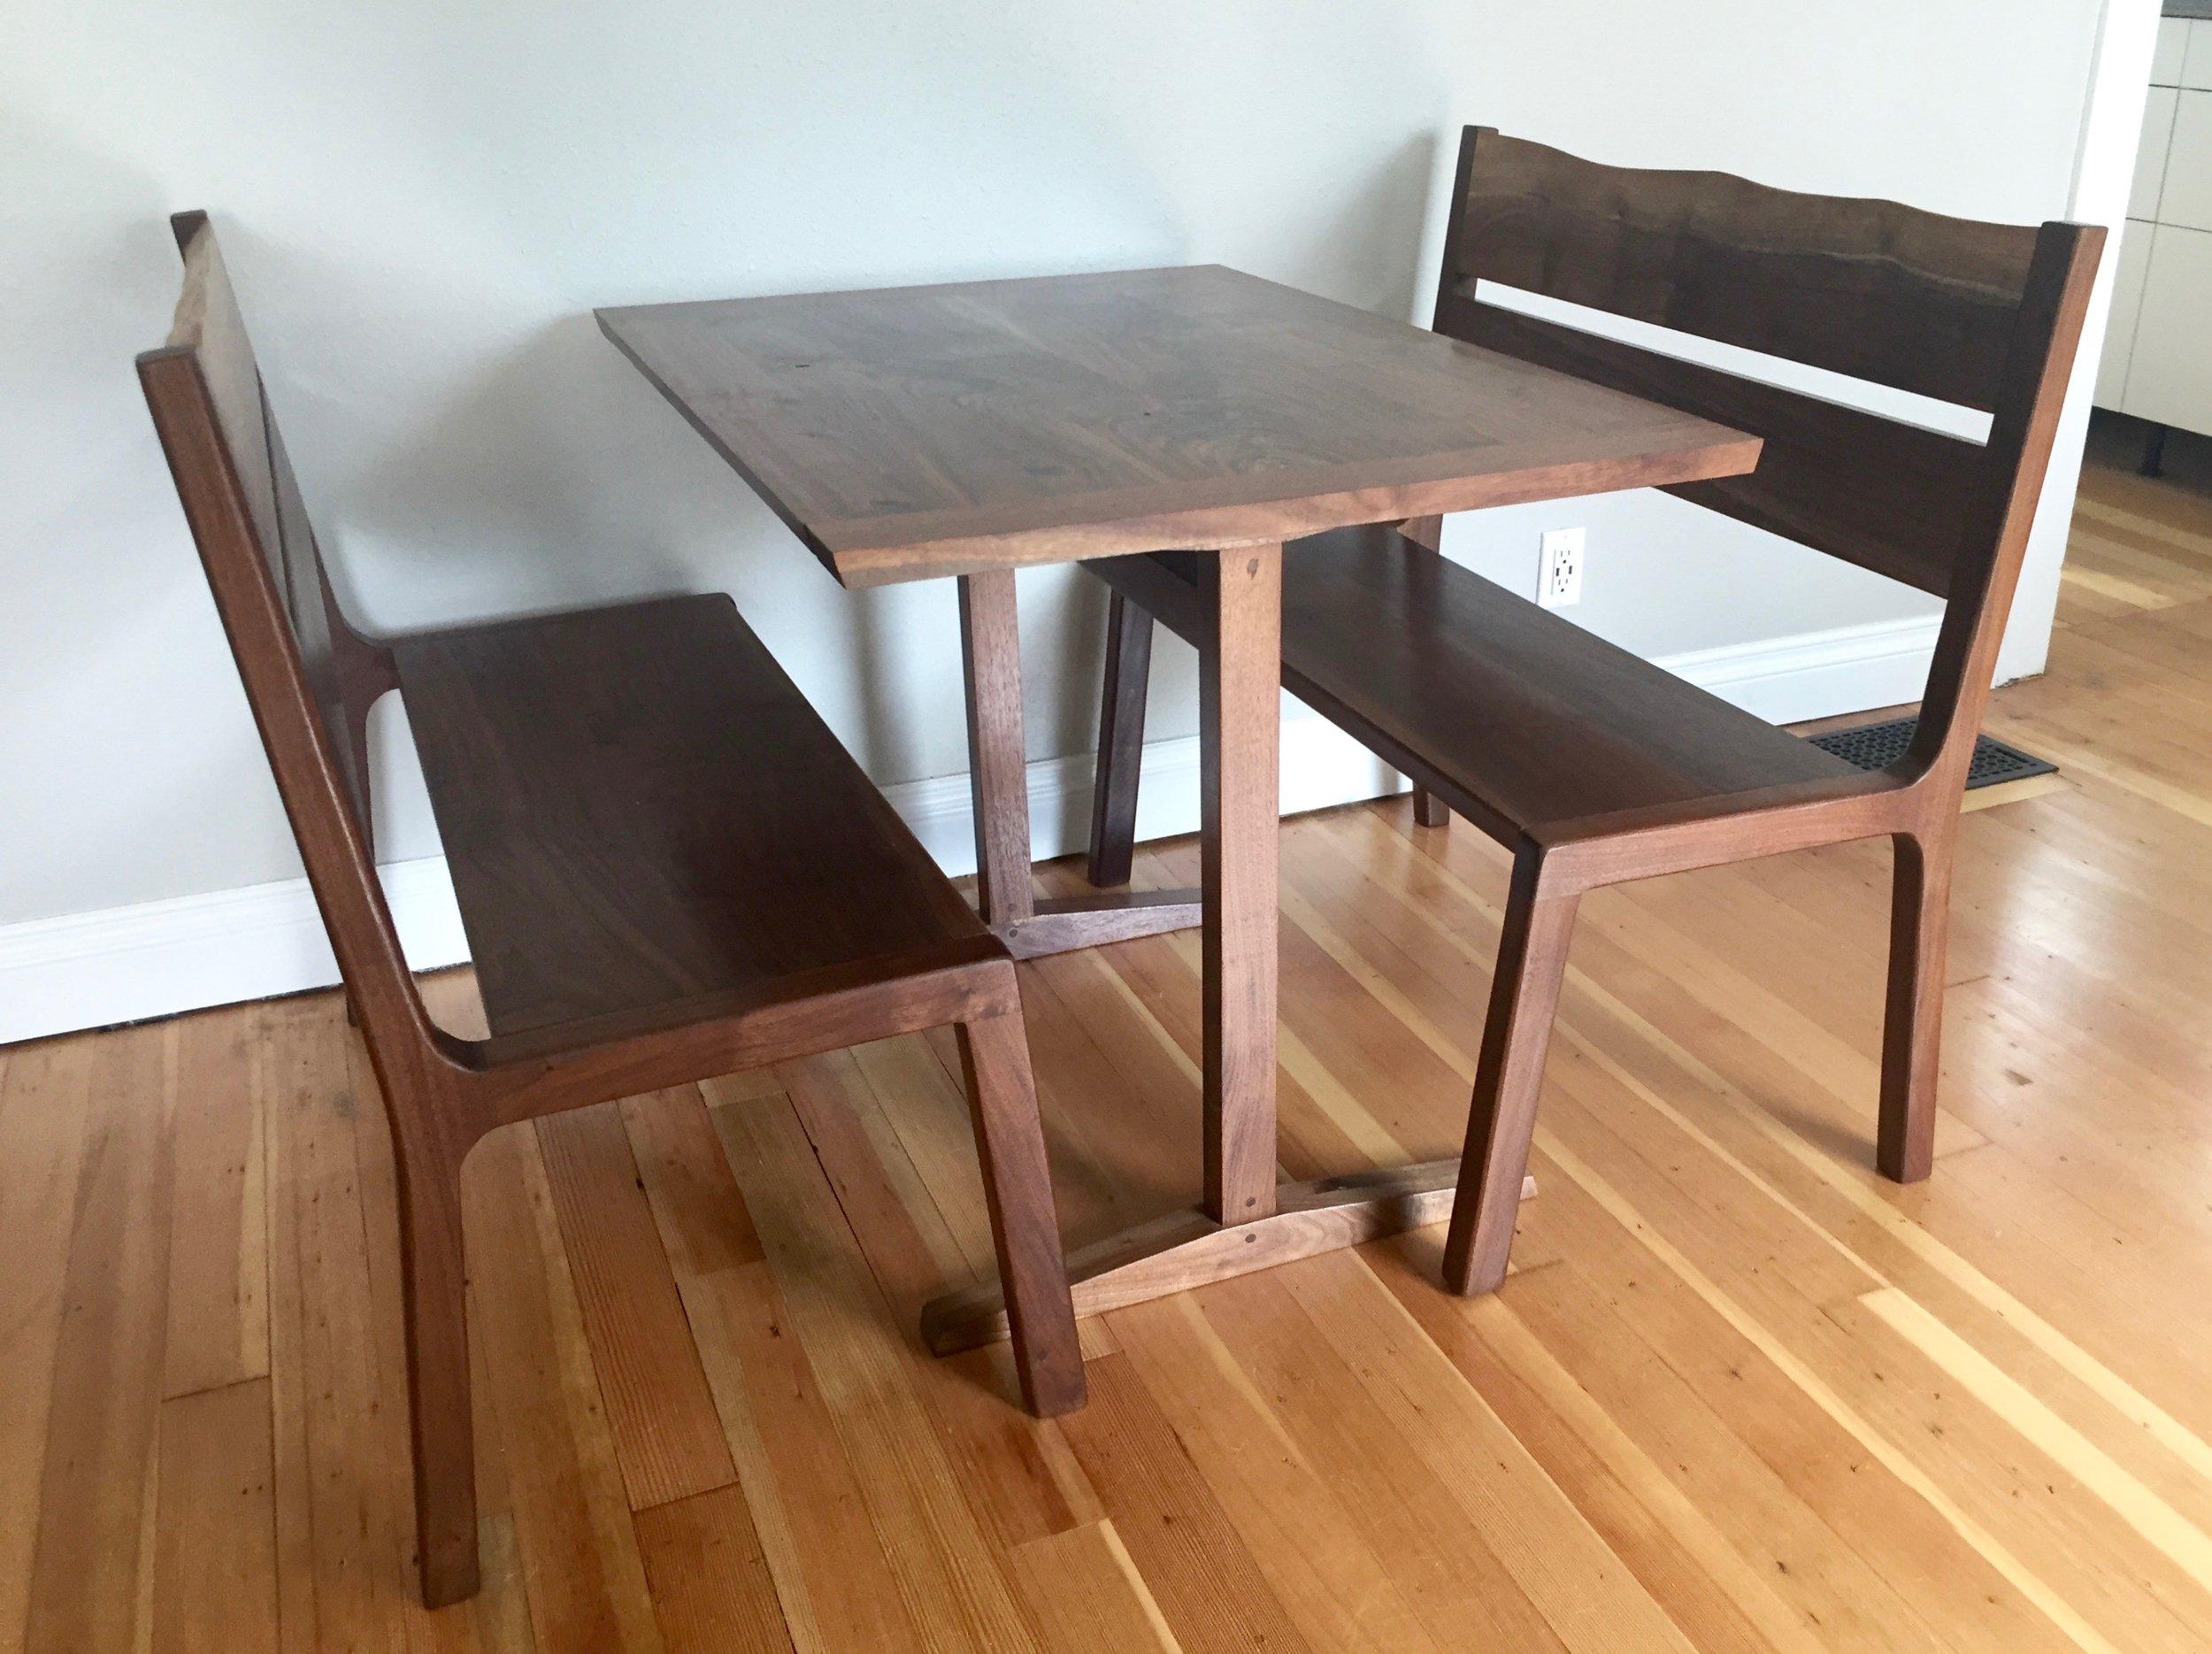 Breakfast Table and Bench Set - Oregon Black Walnut